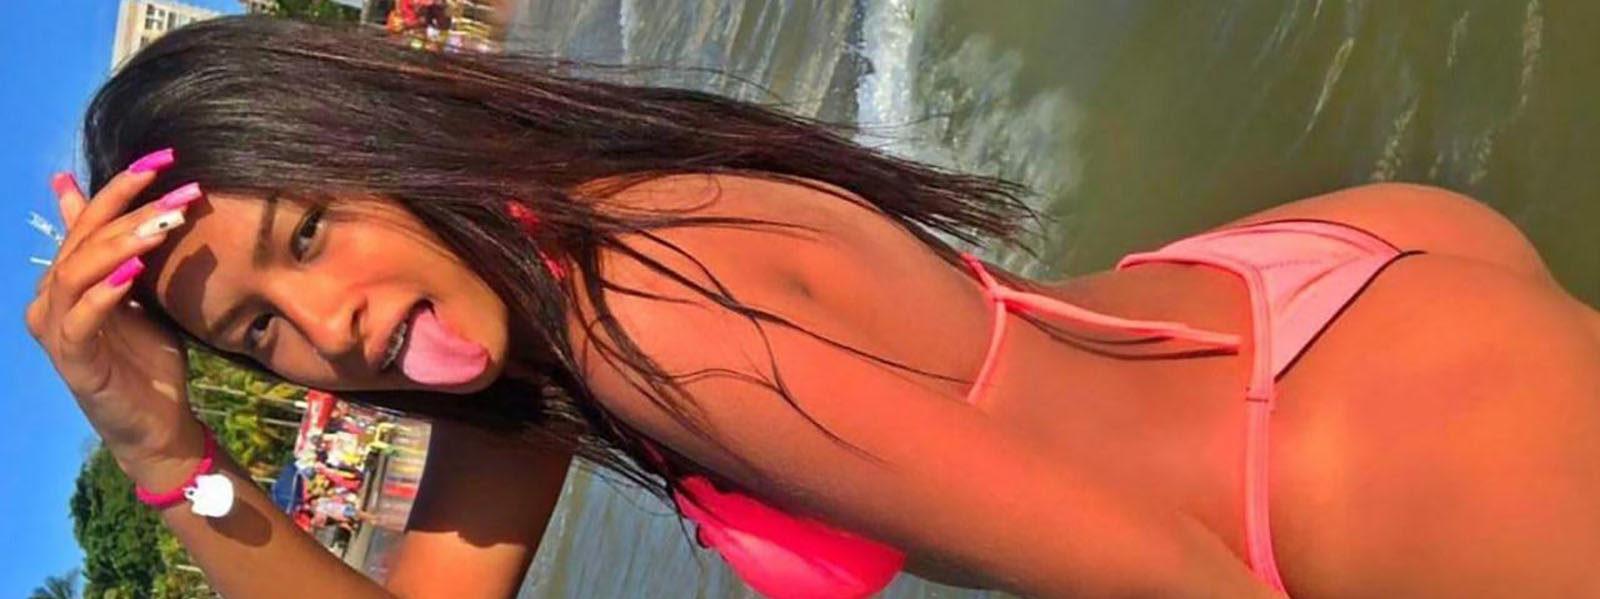 Camila | Mulheres